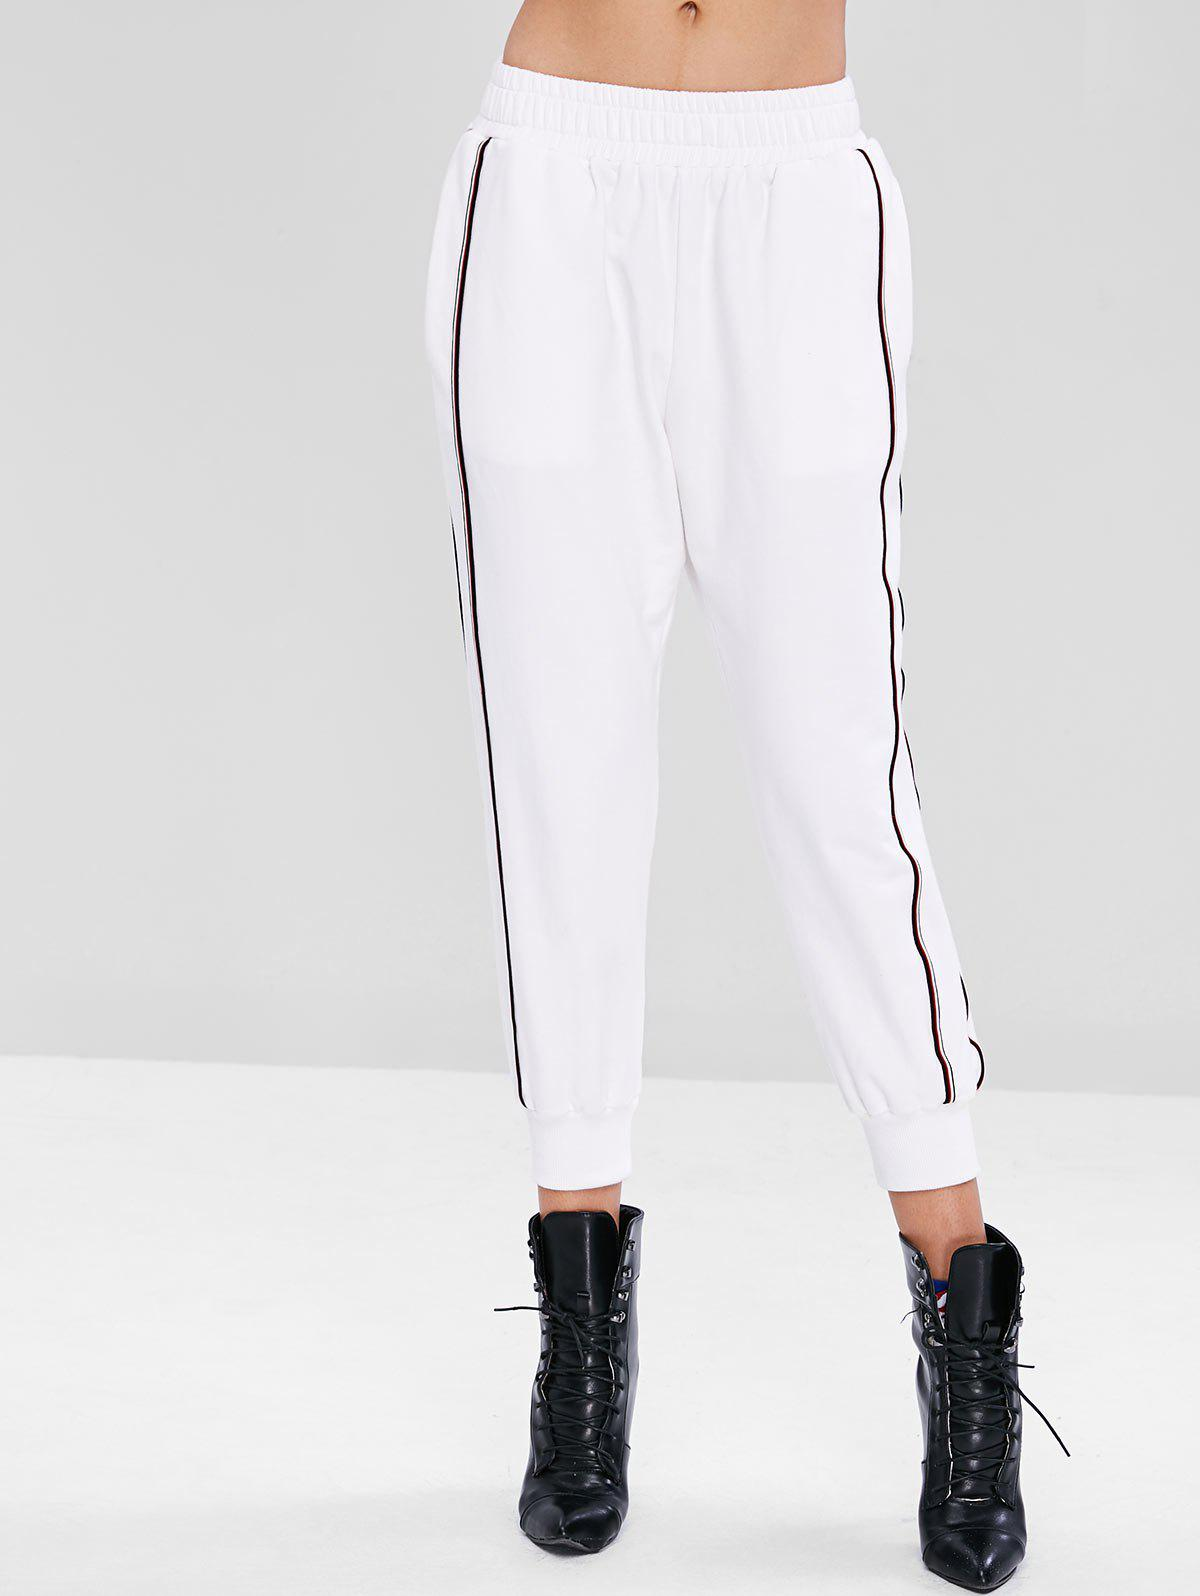 Sporty Striped Panel Ninth Pants